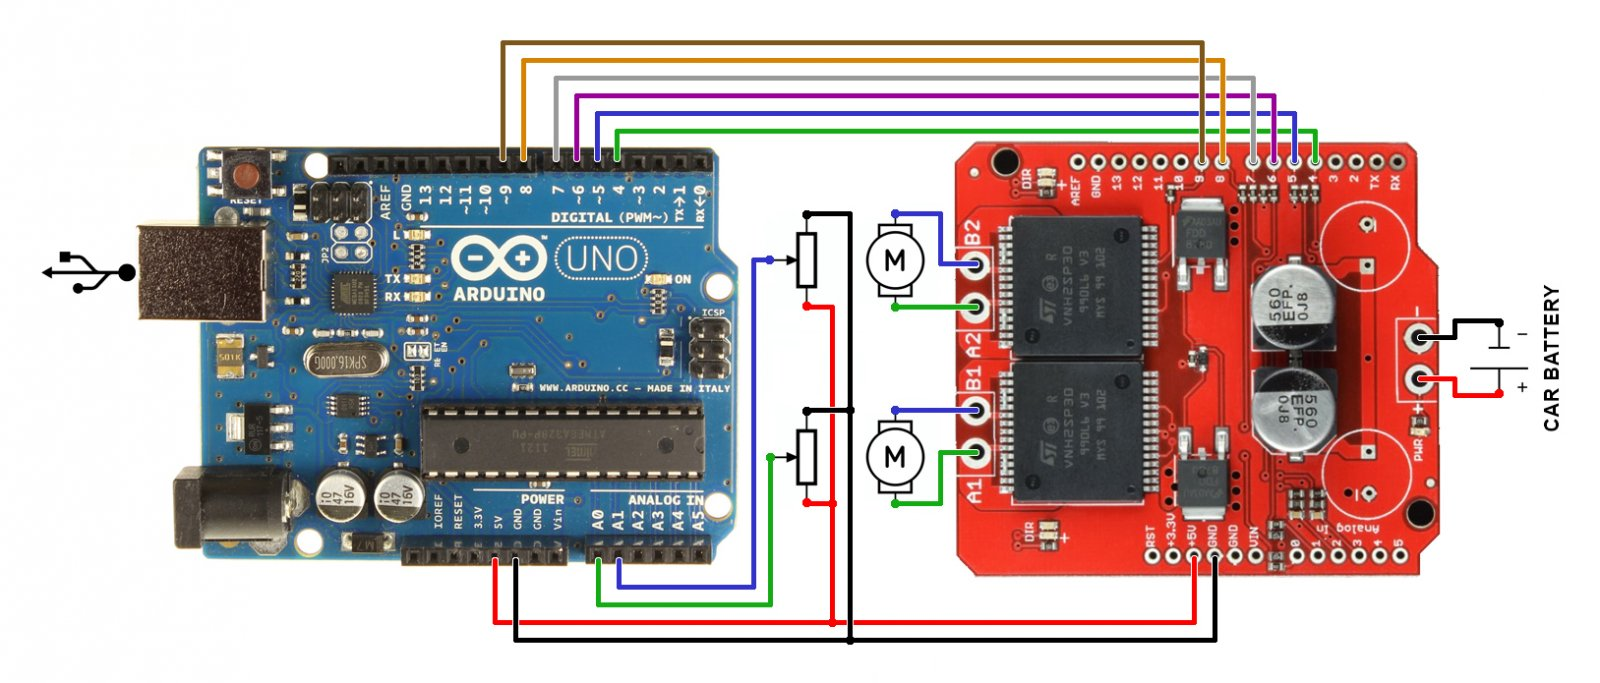 wiring arduino monstermoto.jpg